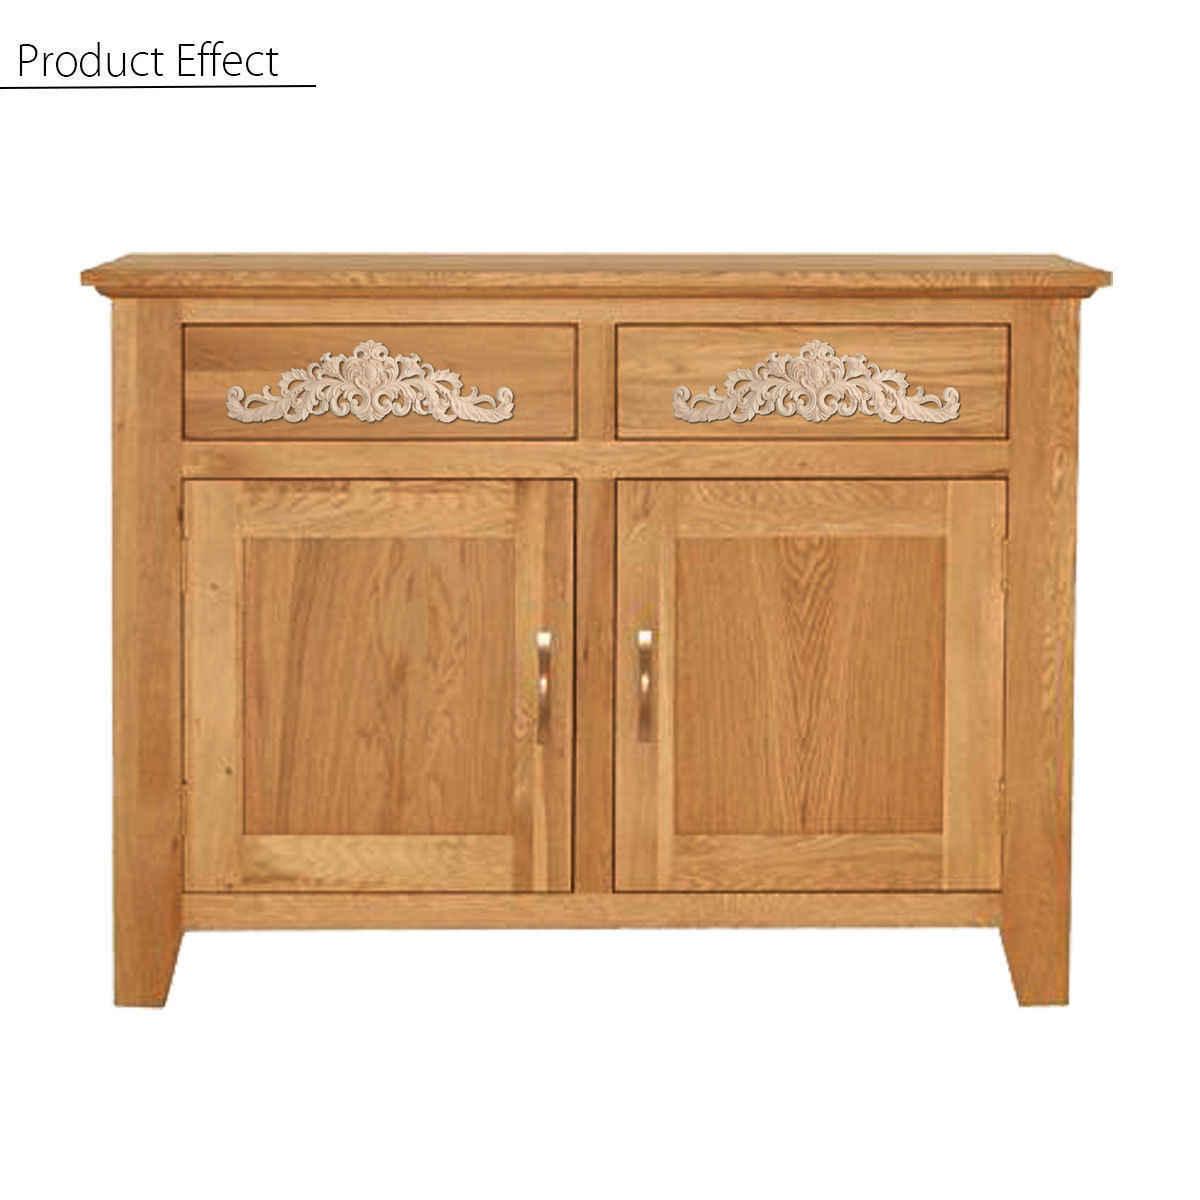 Wood Carved Long Applique Frame Corner Onlay Unpainted Furniture Home Door  Decor